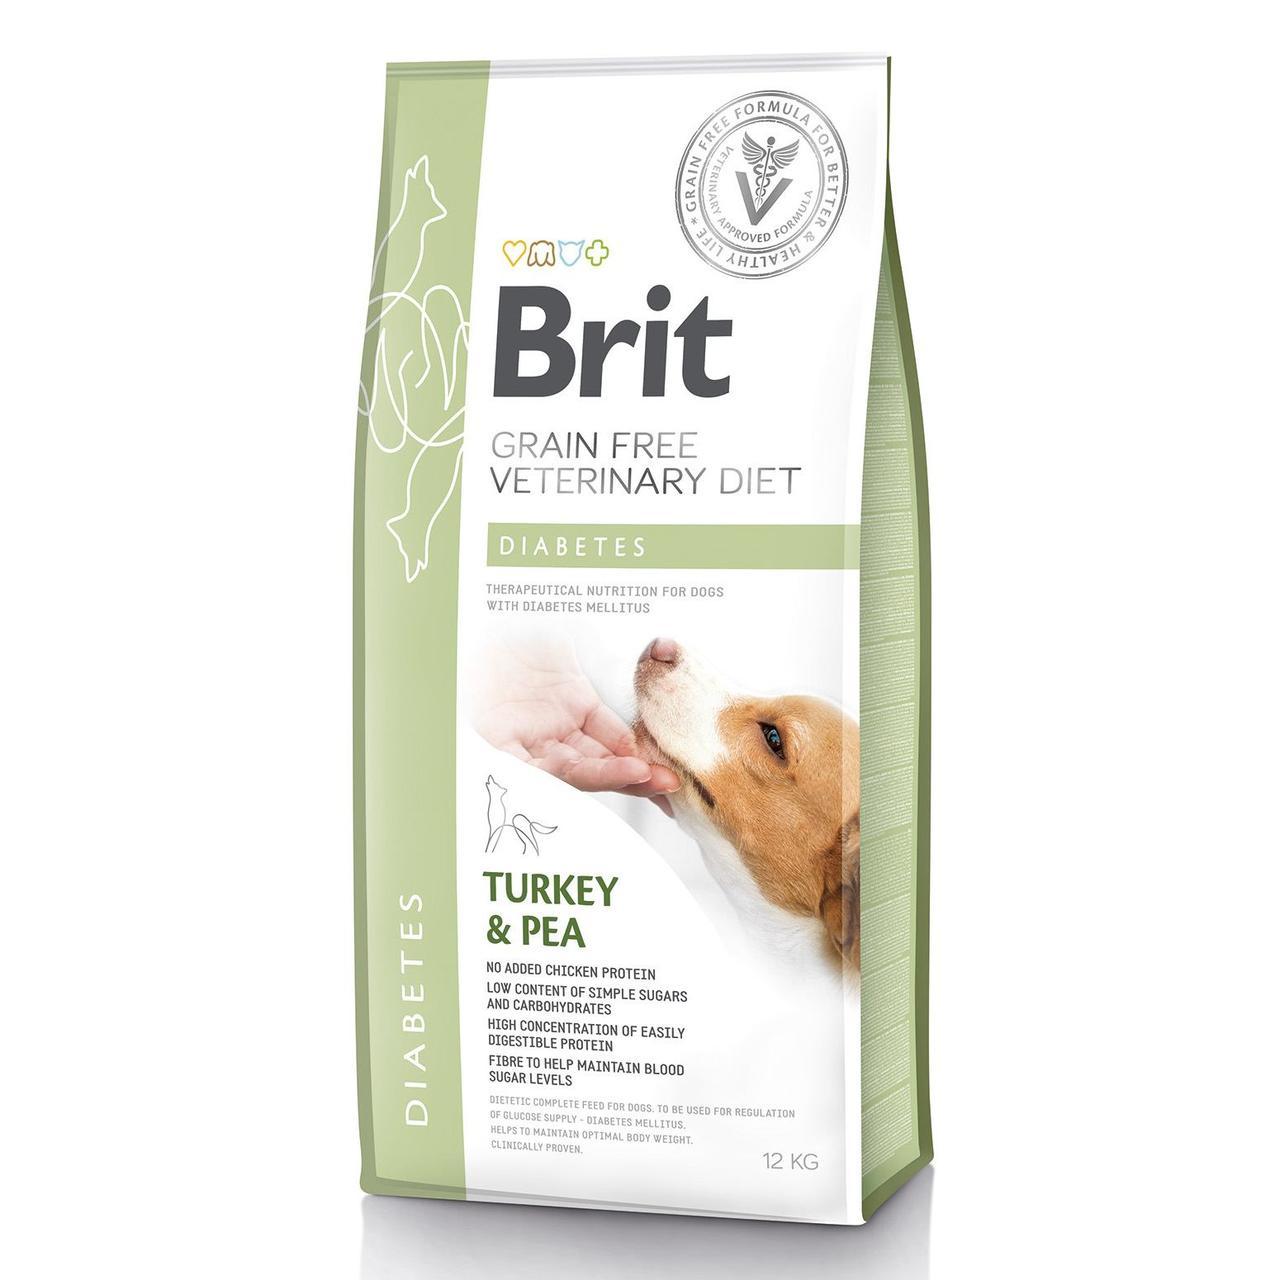 Brit GF VetDiets Dog Diabetes 12 kg при сахарном диабете с идейкой и горохом